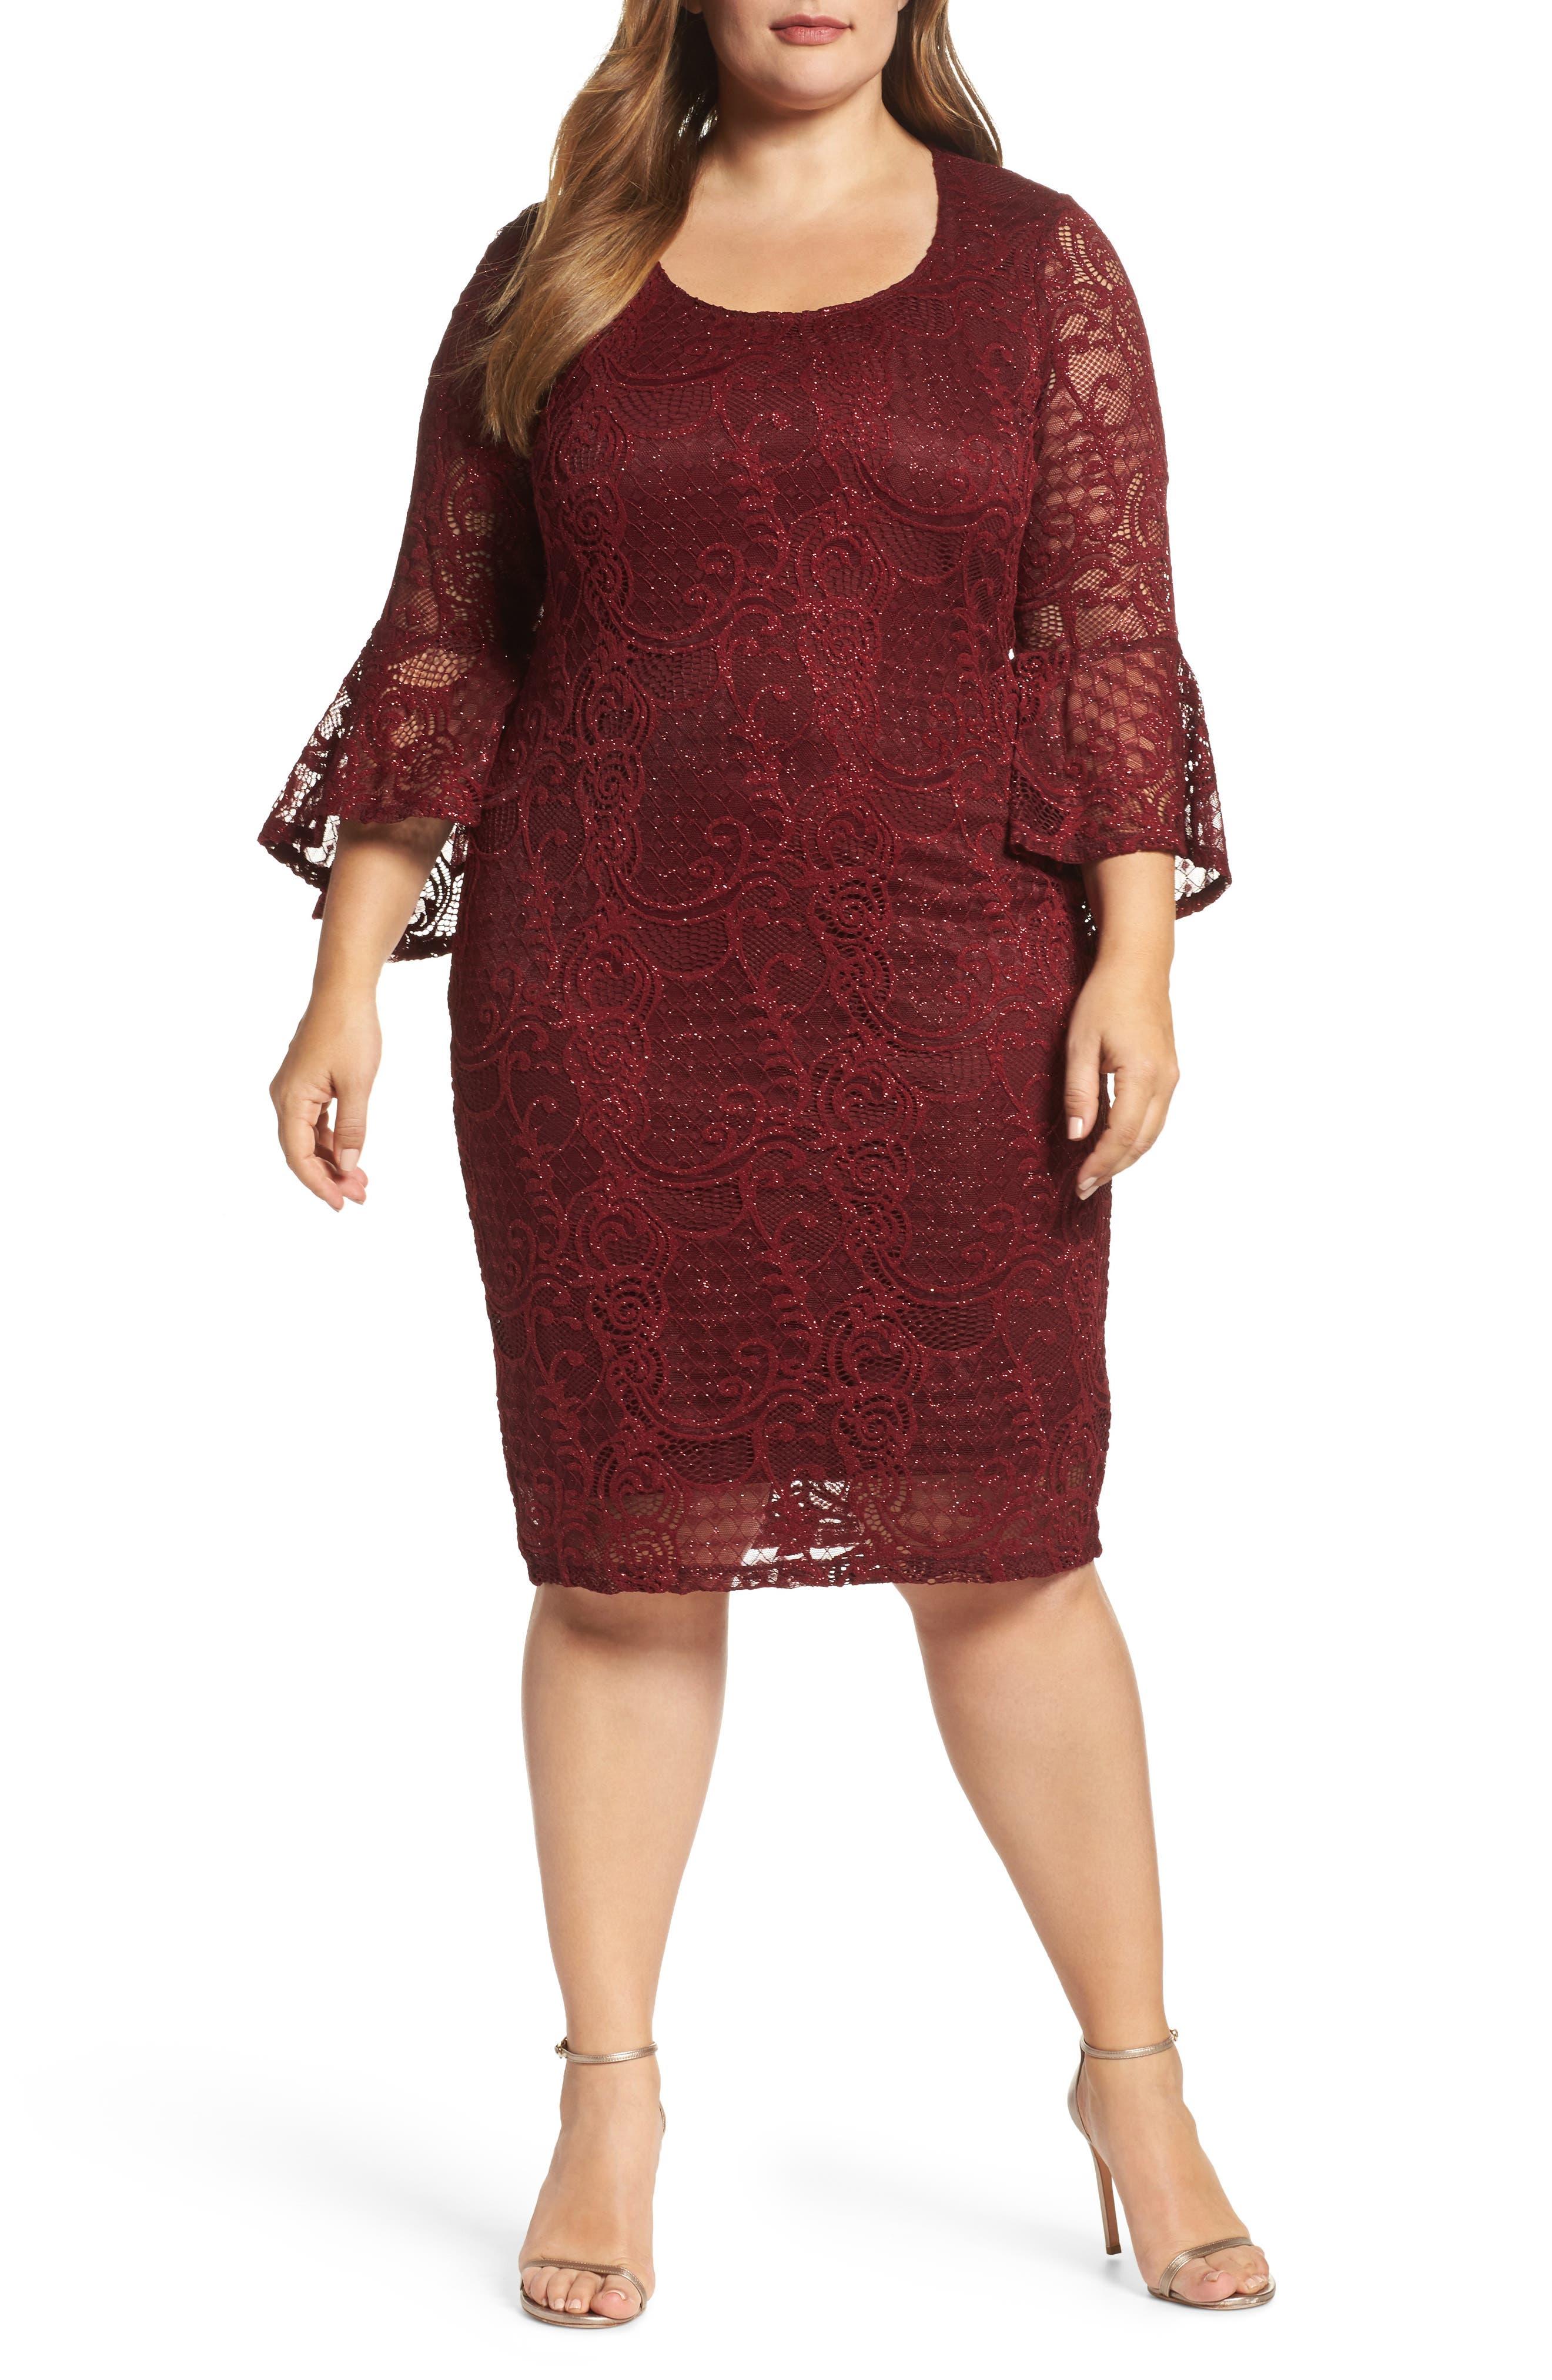 Alternate Image 1 Selected - Marina Bell Sleeve Glitter Lace Sheath Dress (Plus Size)